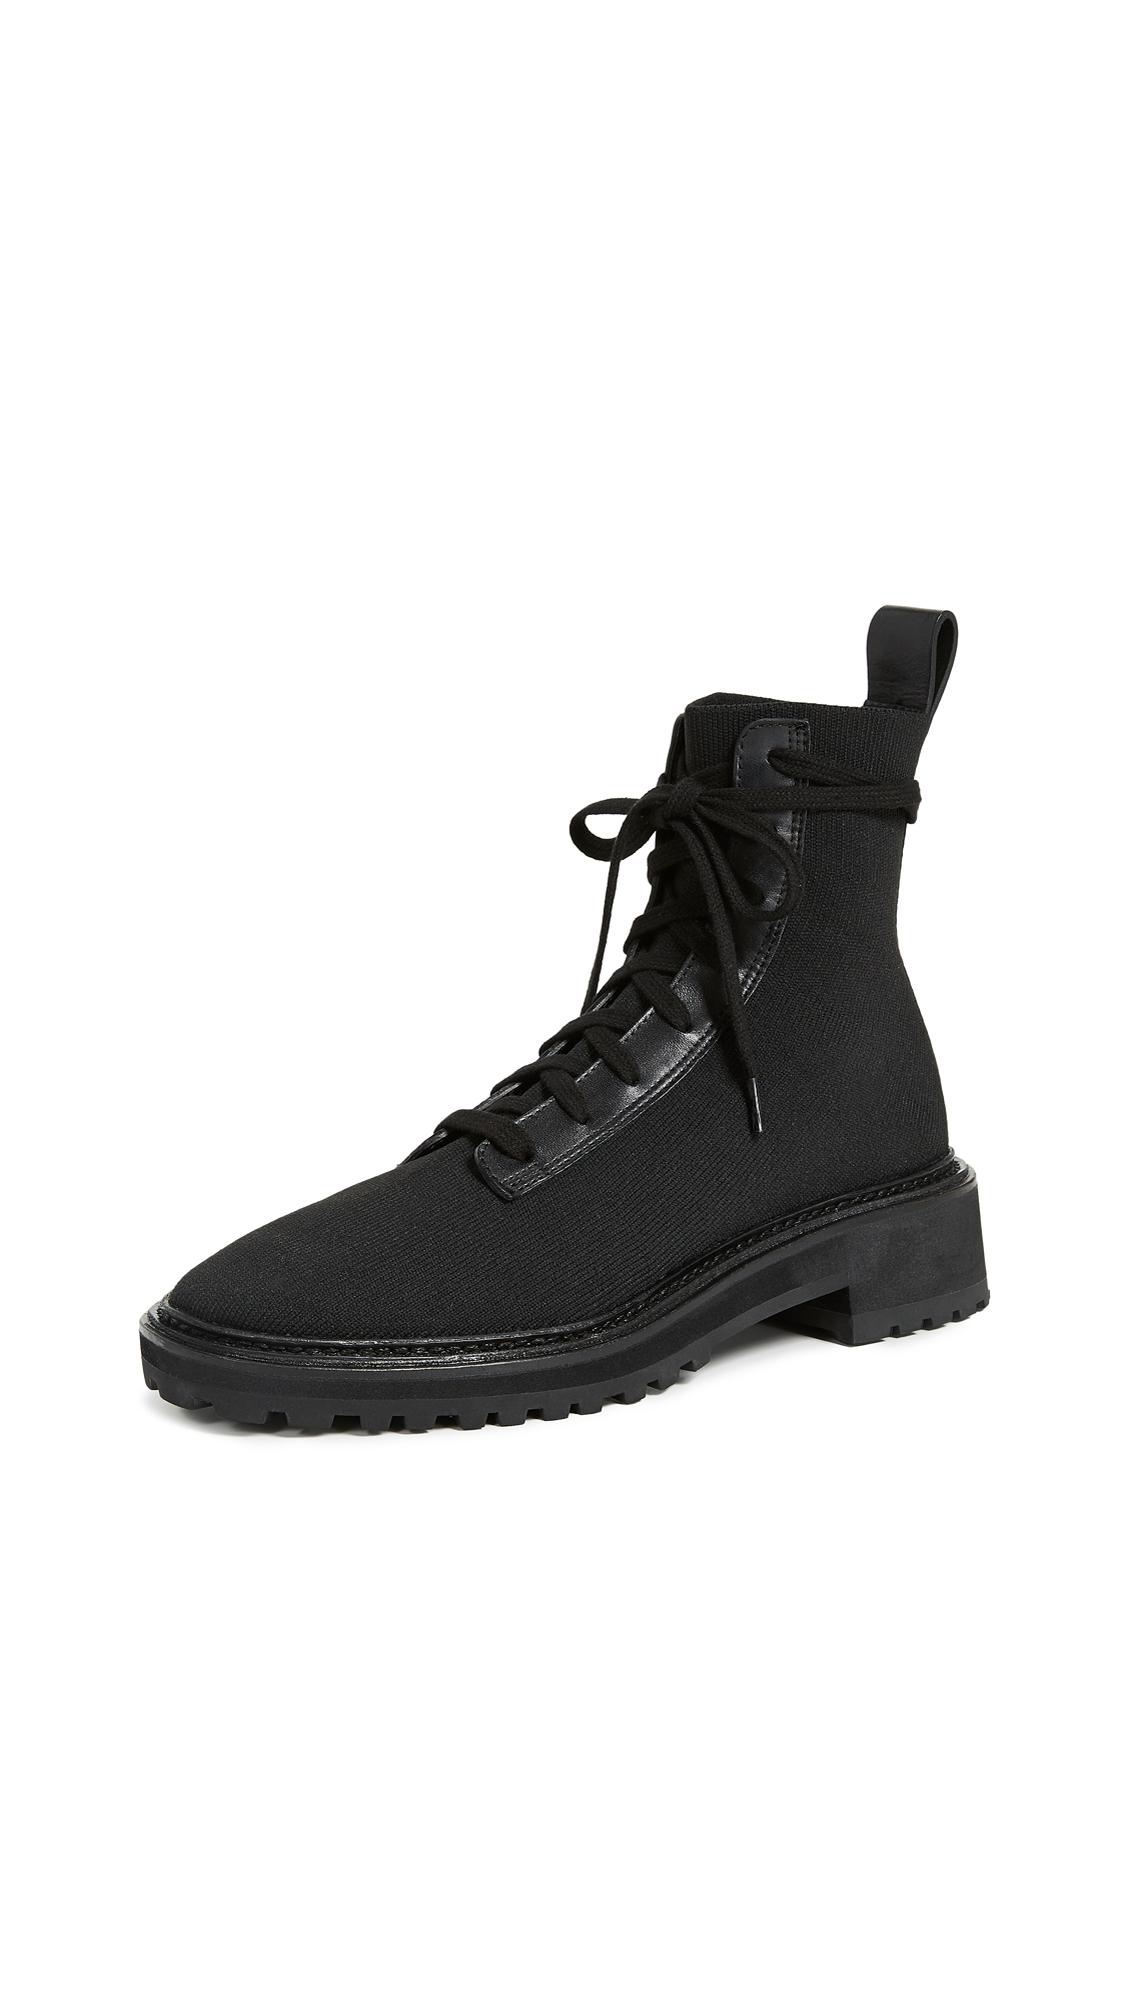 Loeffler Randall Brady Stretch Knit Combat Boots - Black